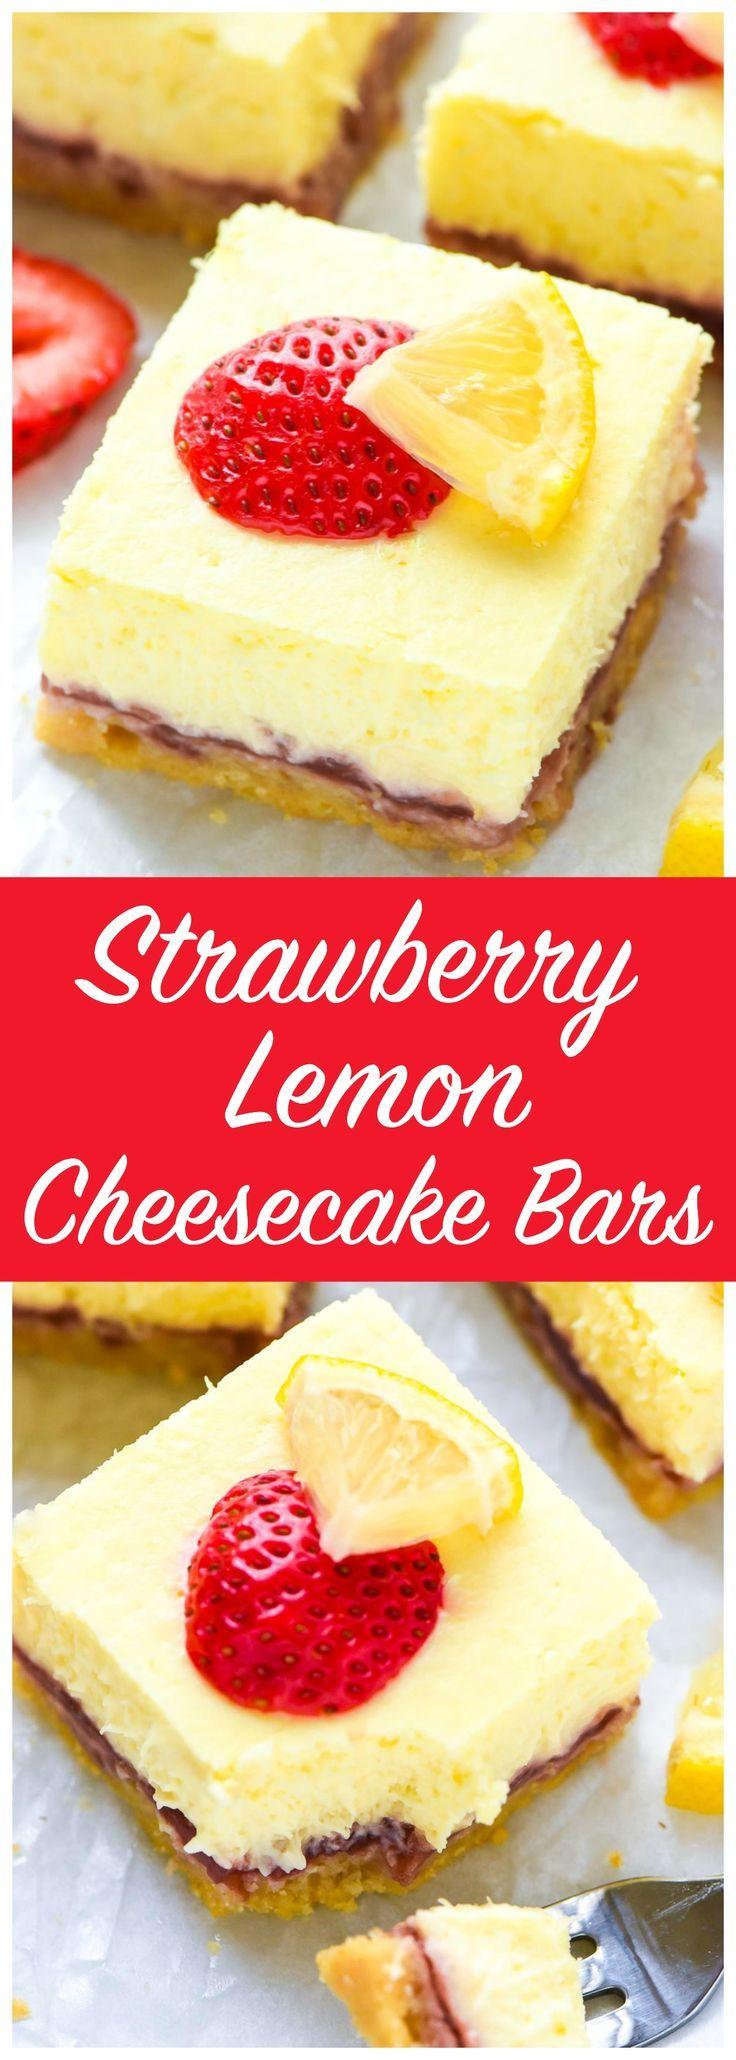 strawberry lemon cheese bars recipe light summer desserts cheesecake and lemon